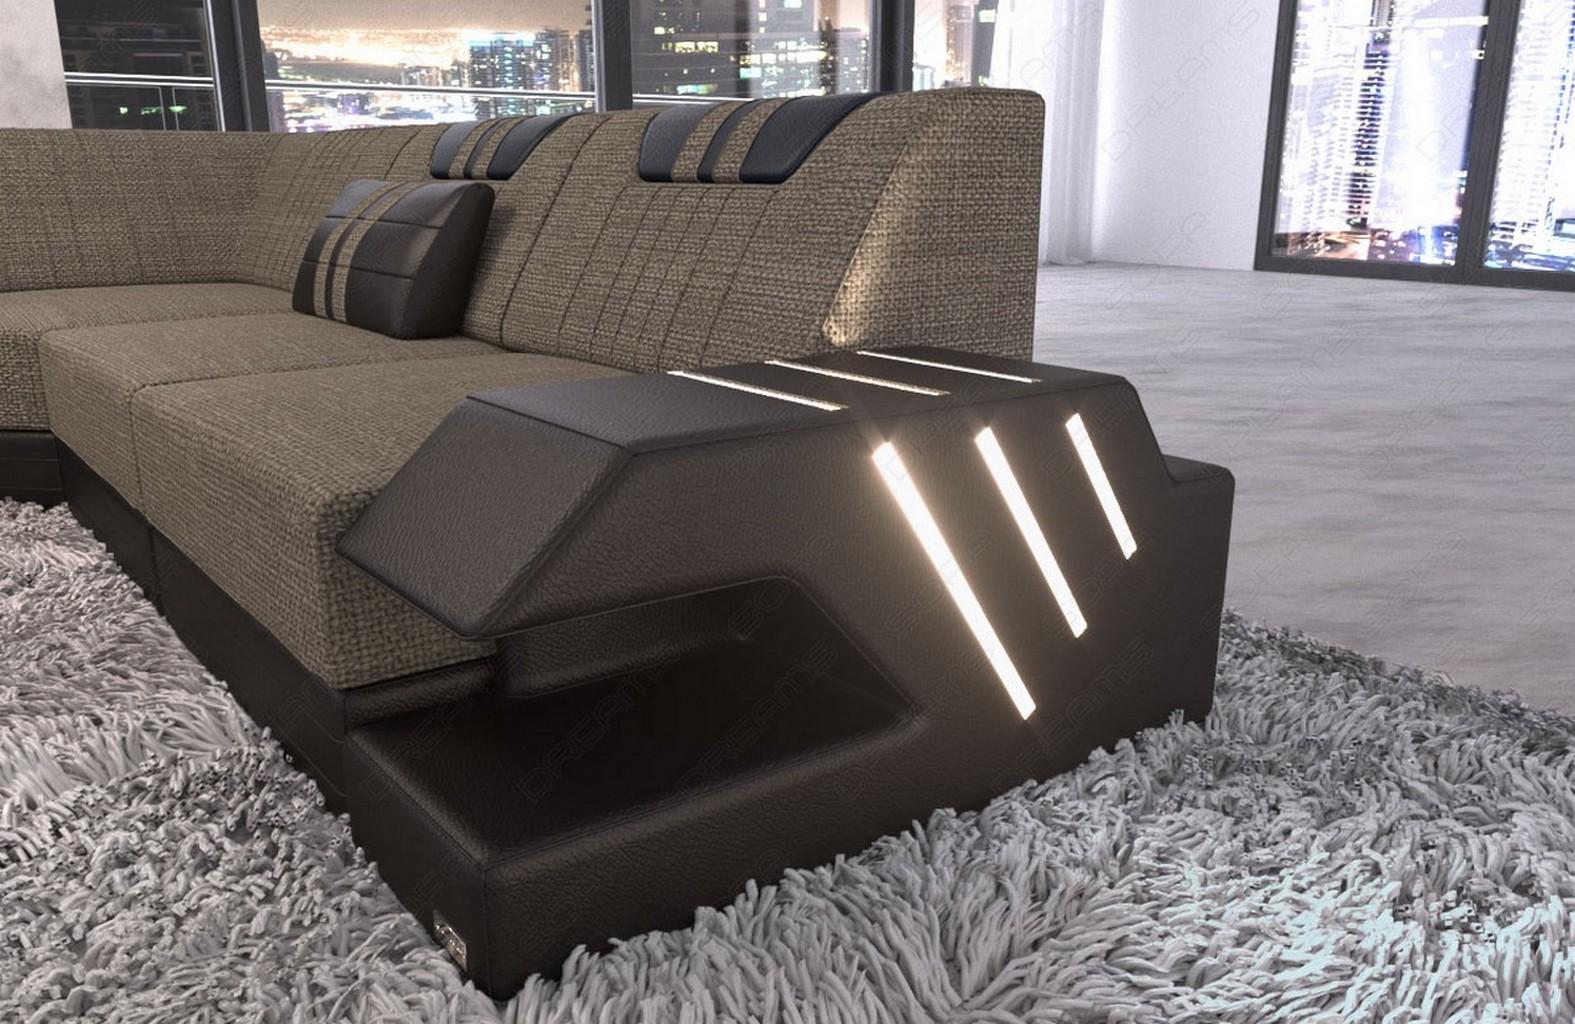 Liebenswert Xxl Couch Dekoration Von Optional Sofa Bed Function. If You Would